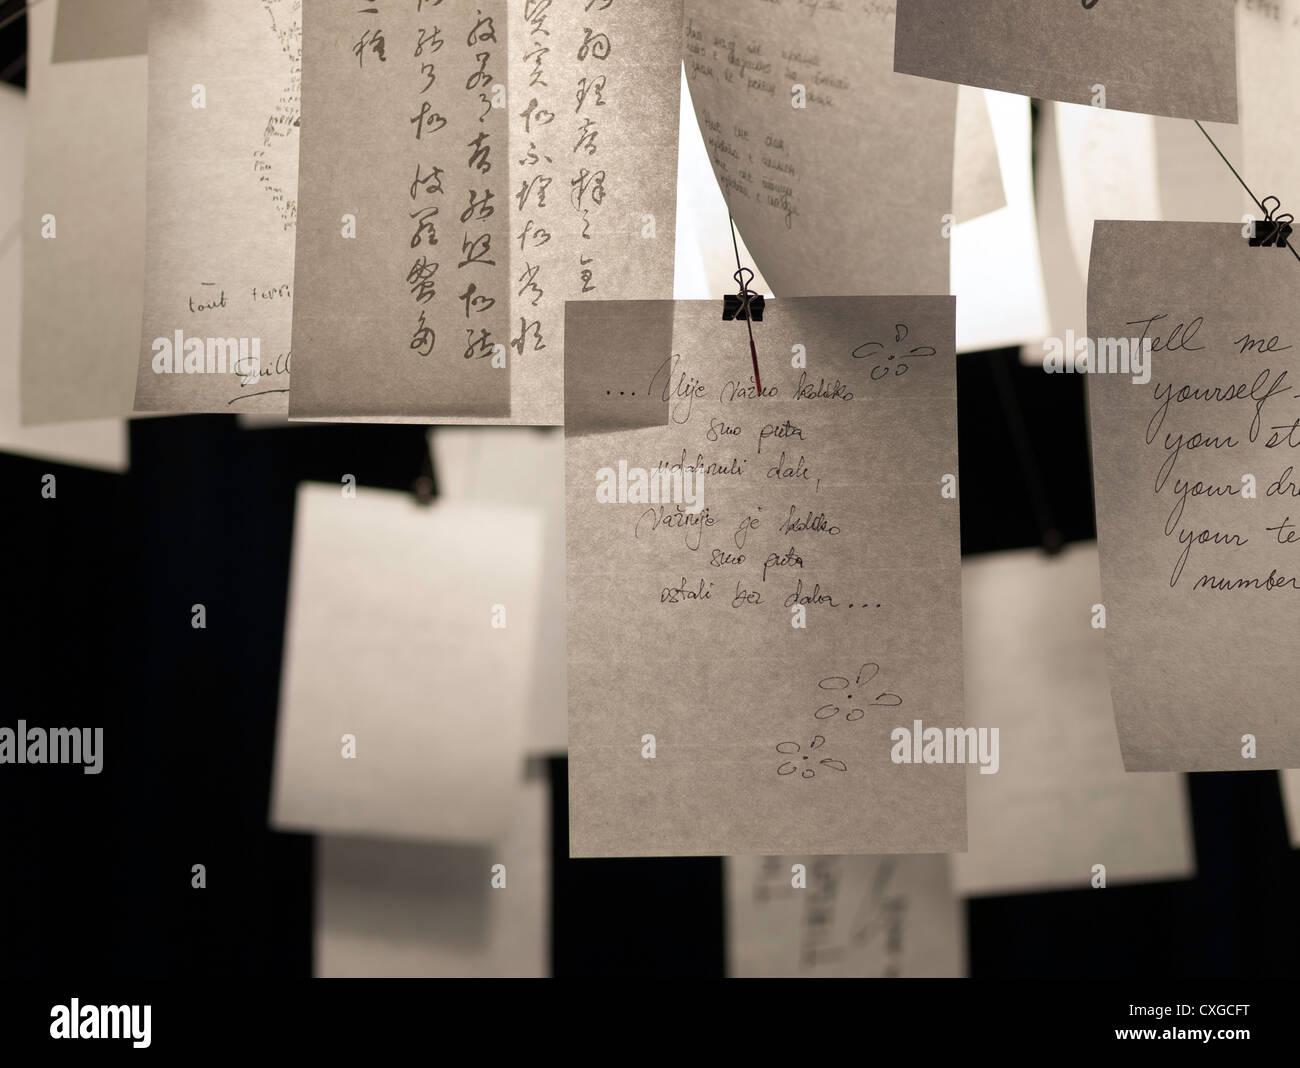 Ingo Maurer Zettel Z 5 Lampe Detail Stockfoto Bild 50762876 Alamy